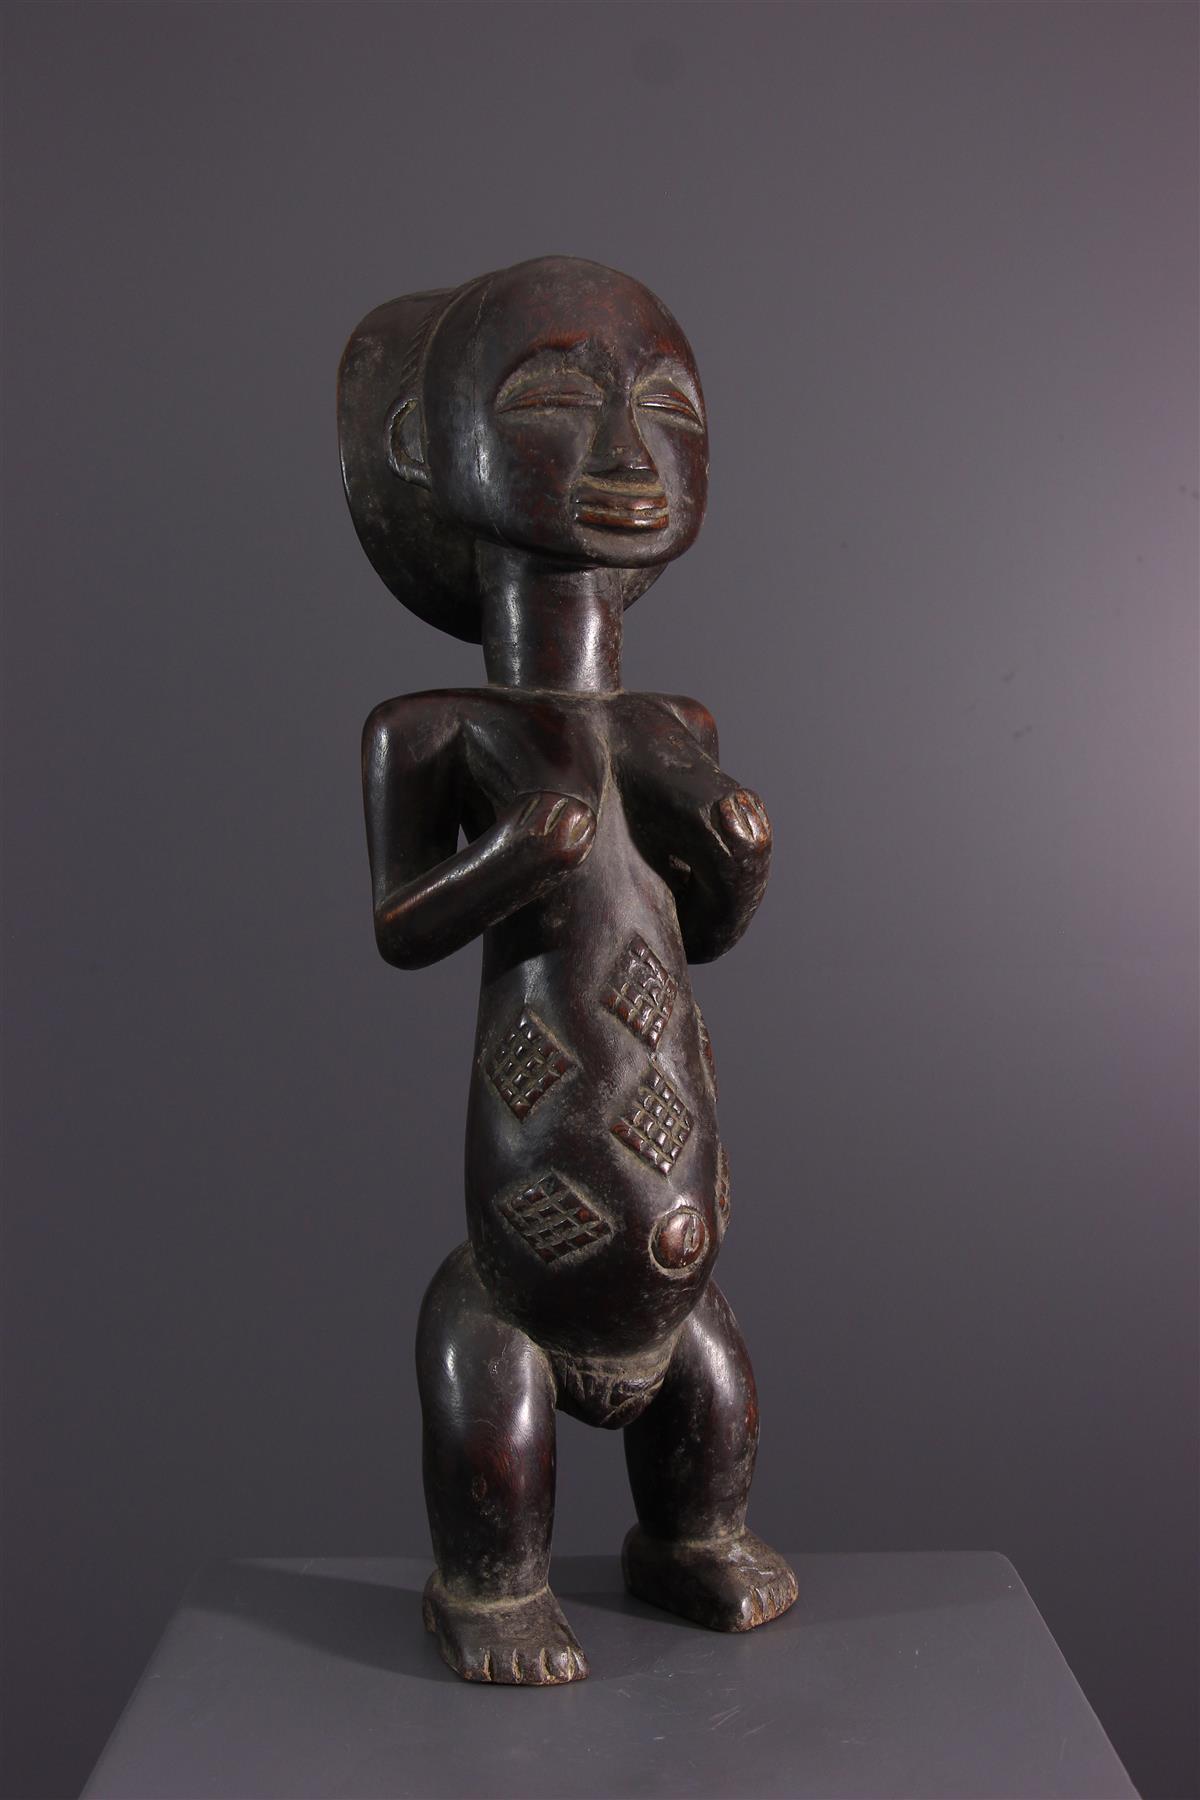 Luba statue - Tribal art